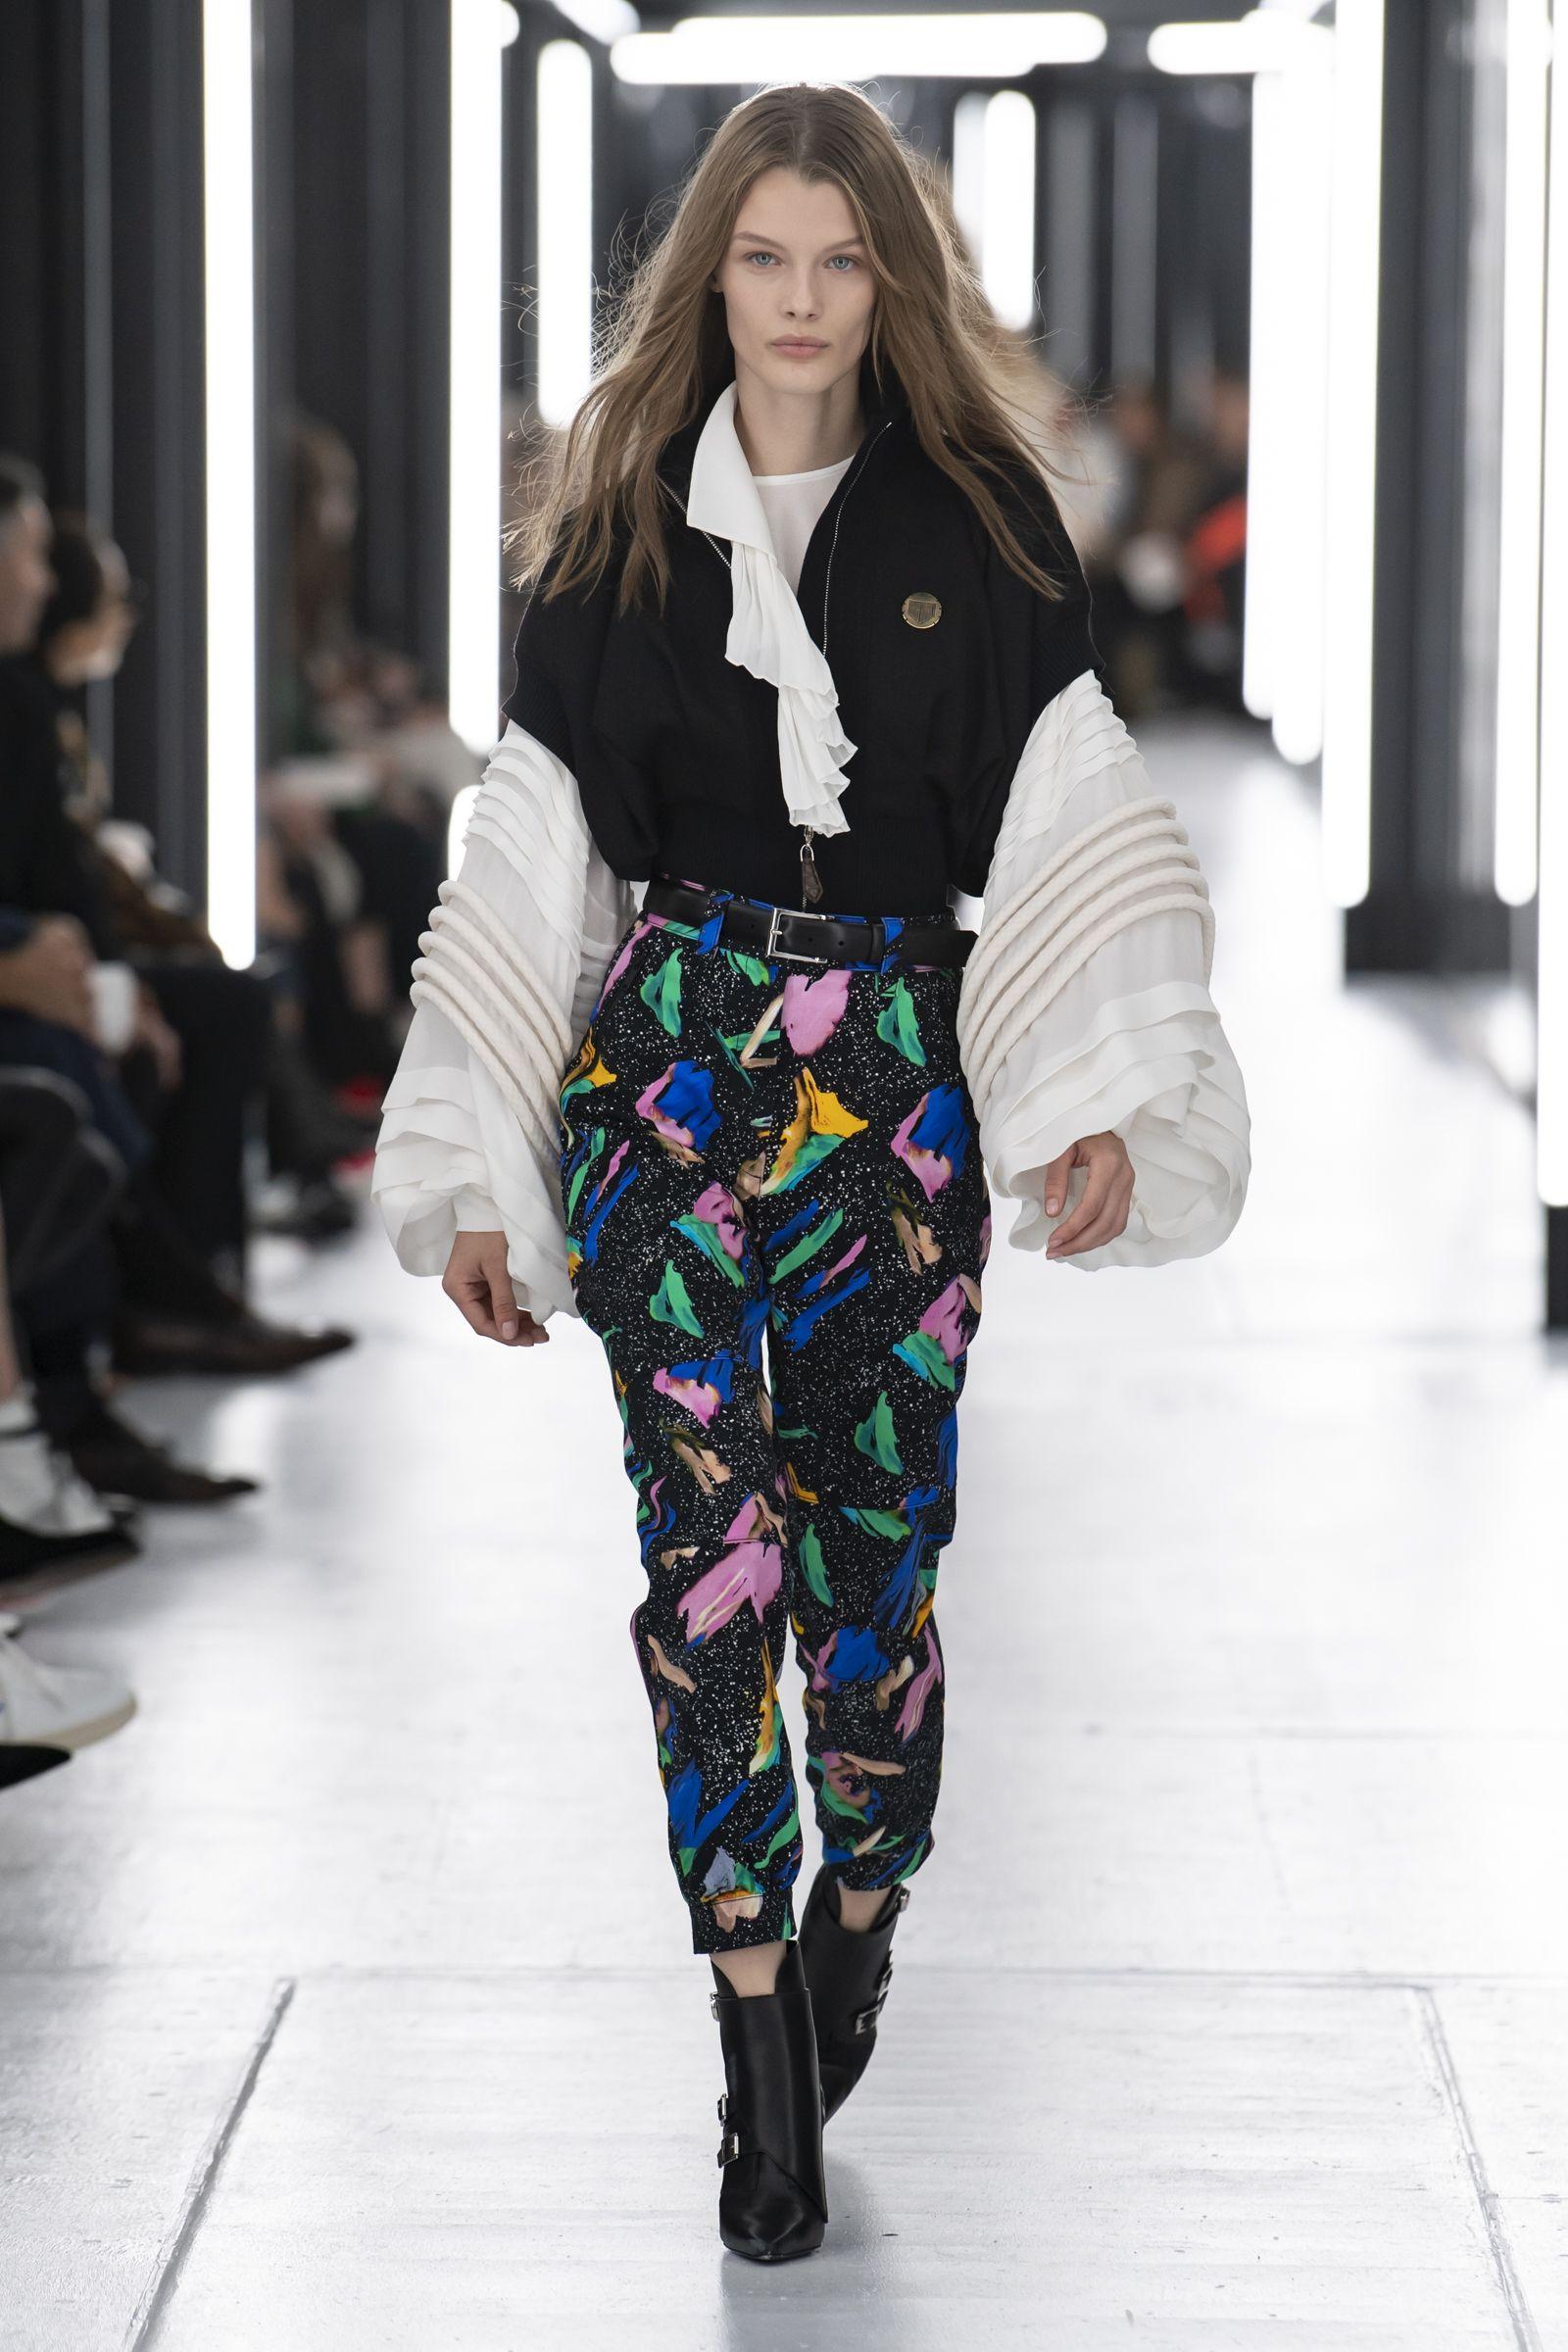 Look from the Louis Vuitton Women's SpringSummer 2019